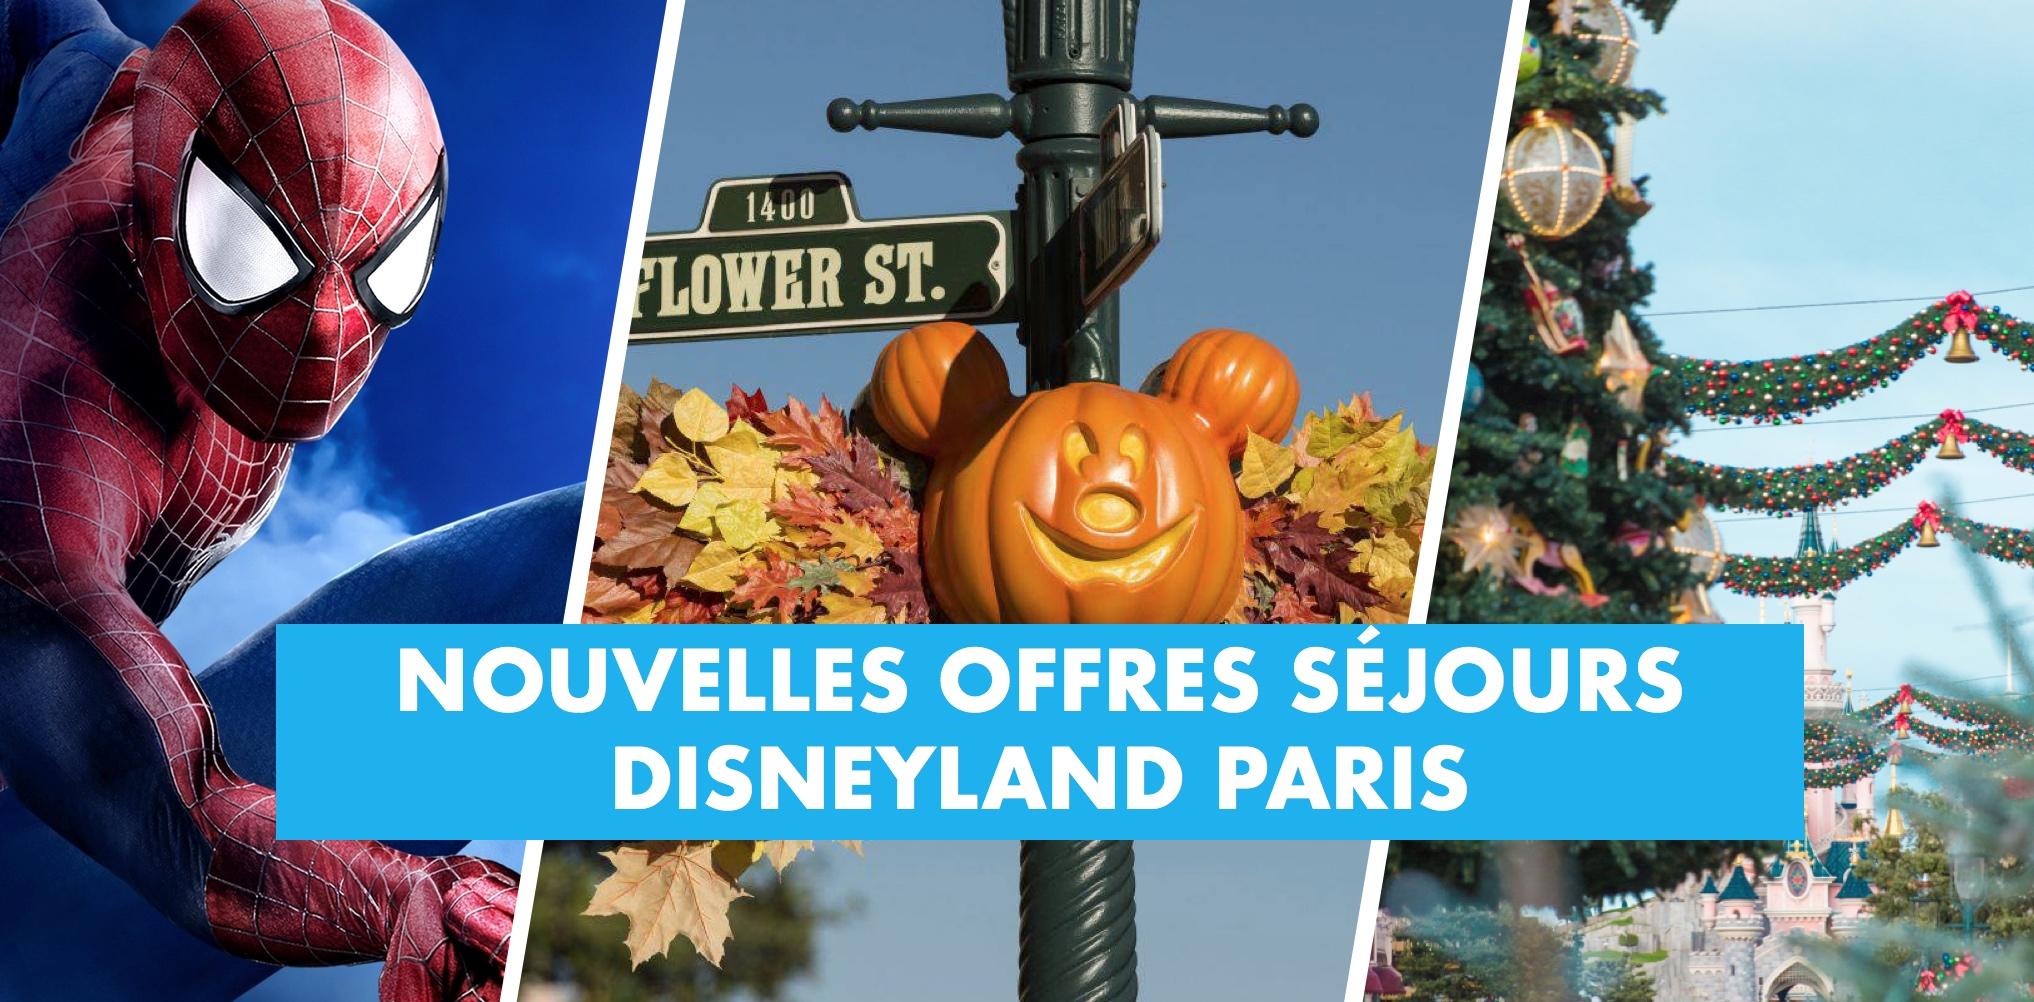 disneyland paris offre noel 2018 Offres promotionnelles   Daily Disneyland disneyland paris offre noel 2018